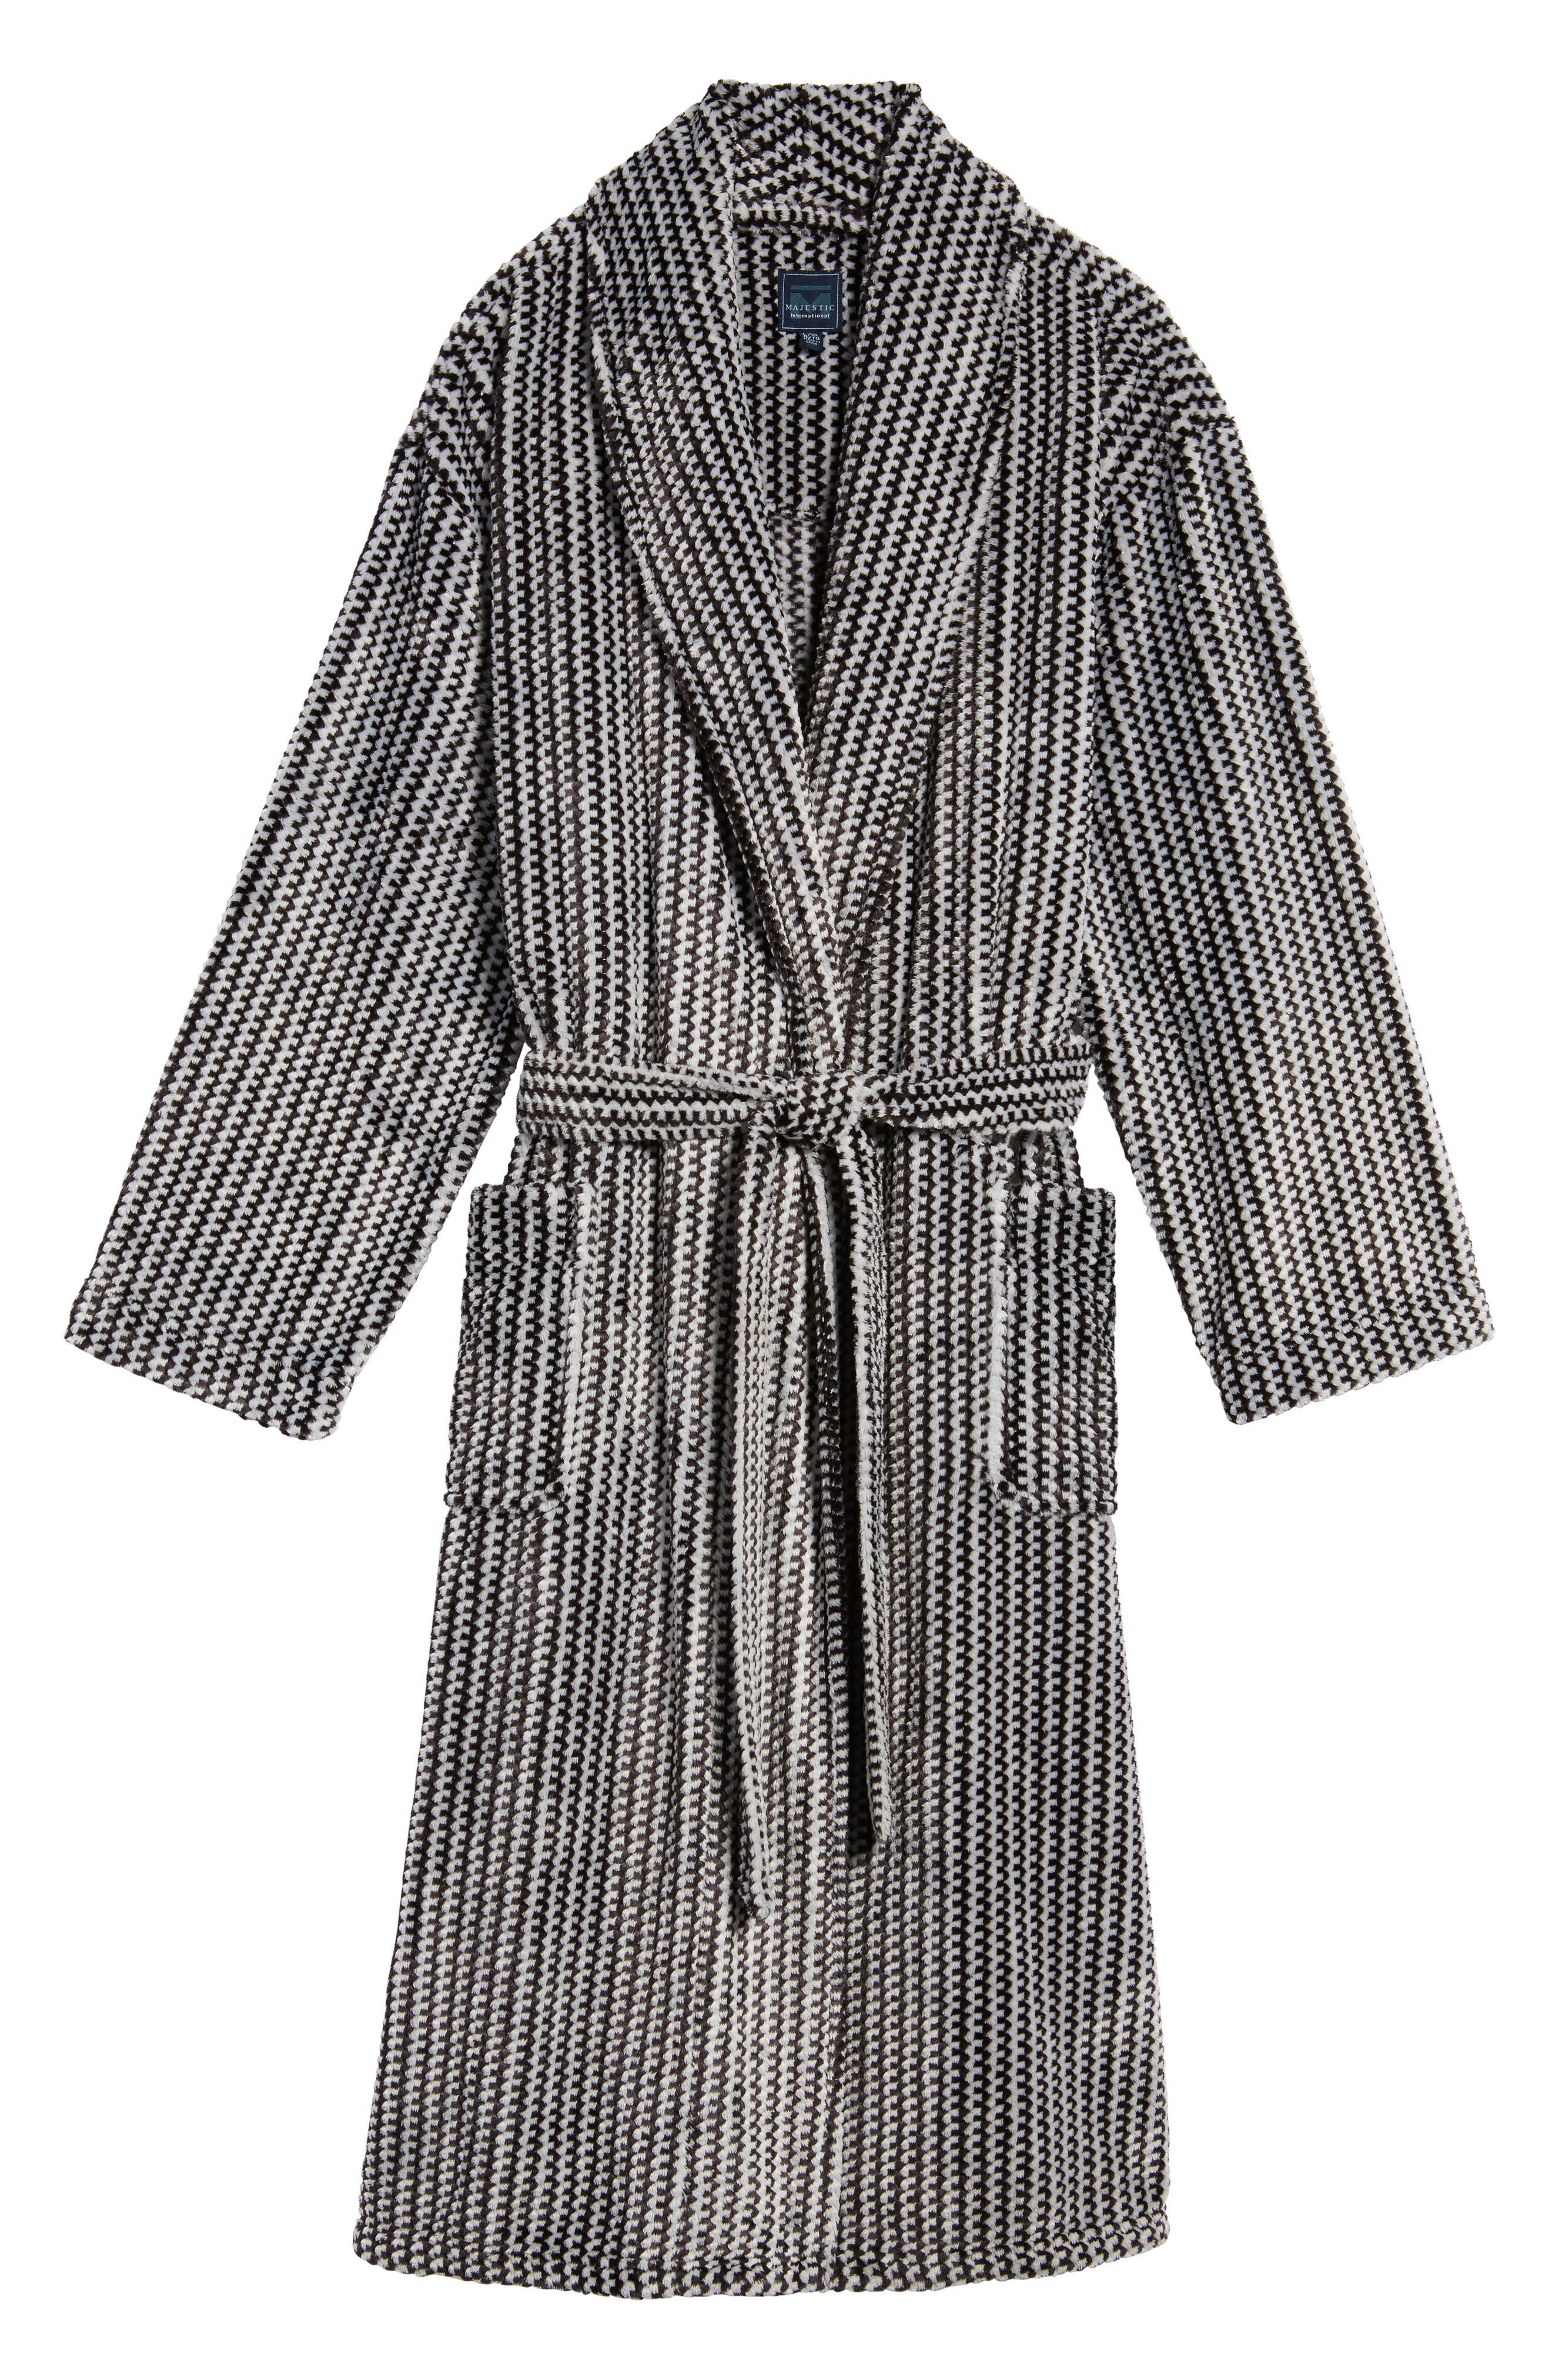 Metro Marled Robe,                             Alternate thumbnail 6, color,                             010